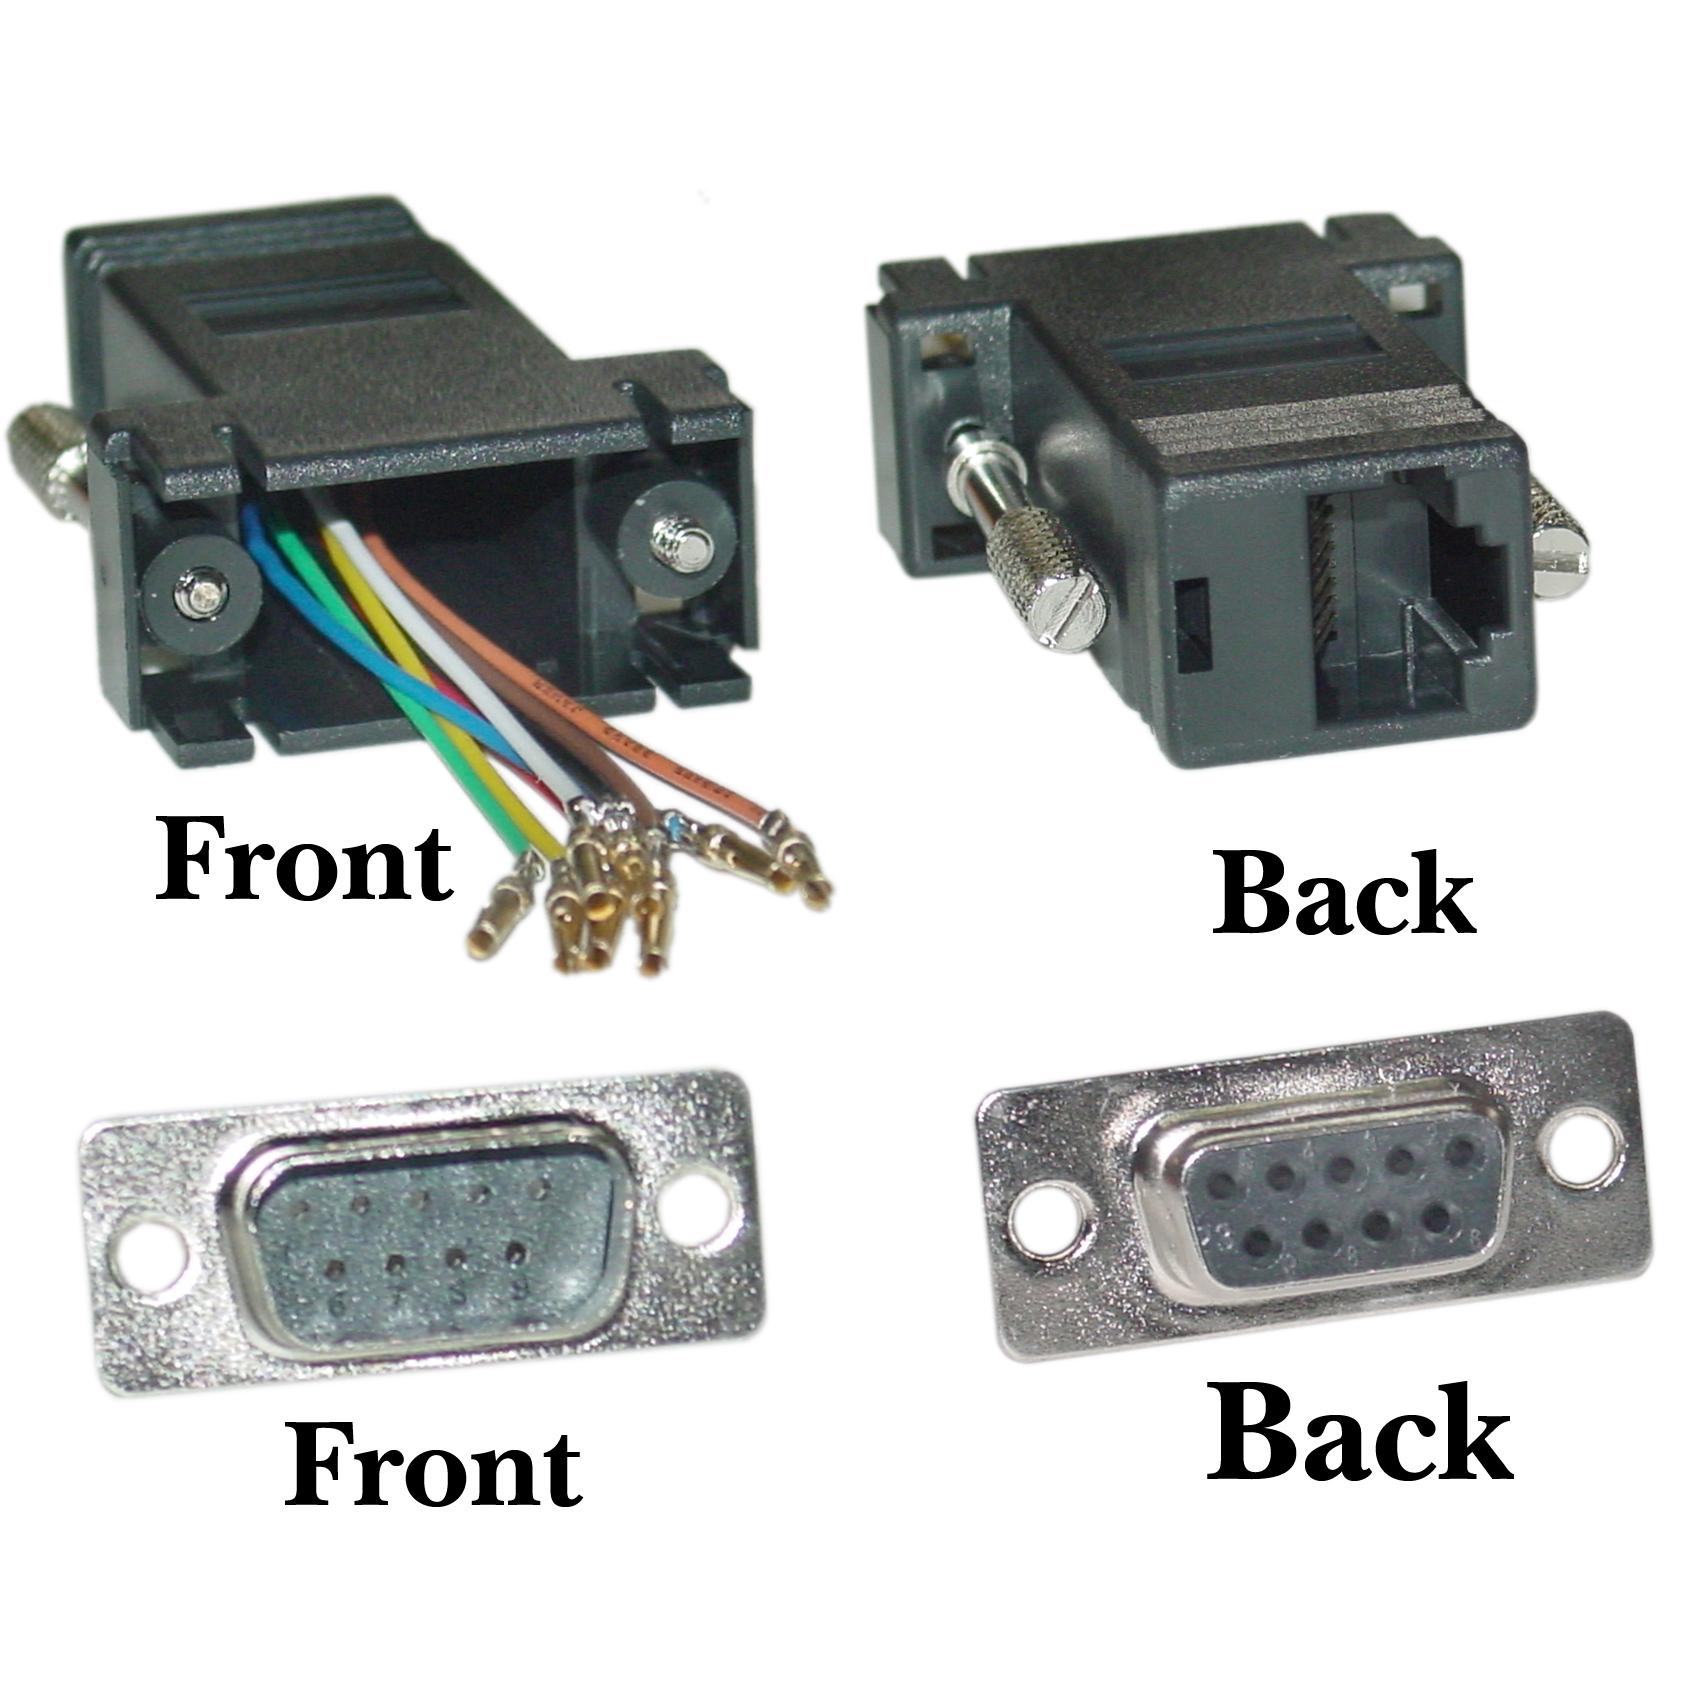 Modular Adapter Db9 Male To Rj45 Black